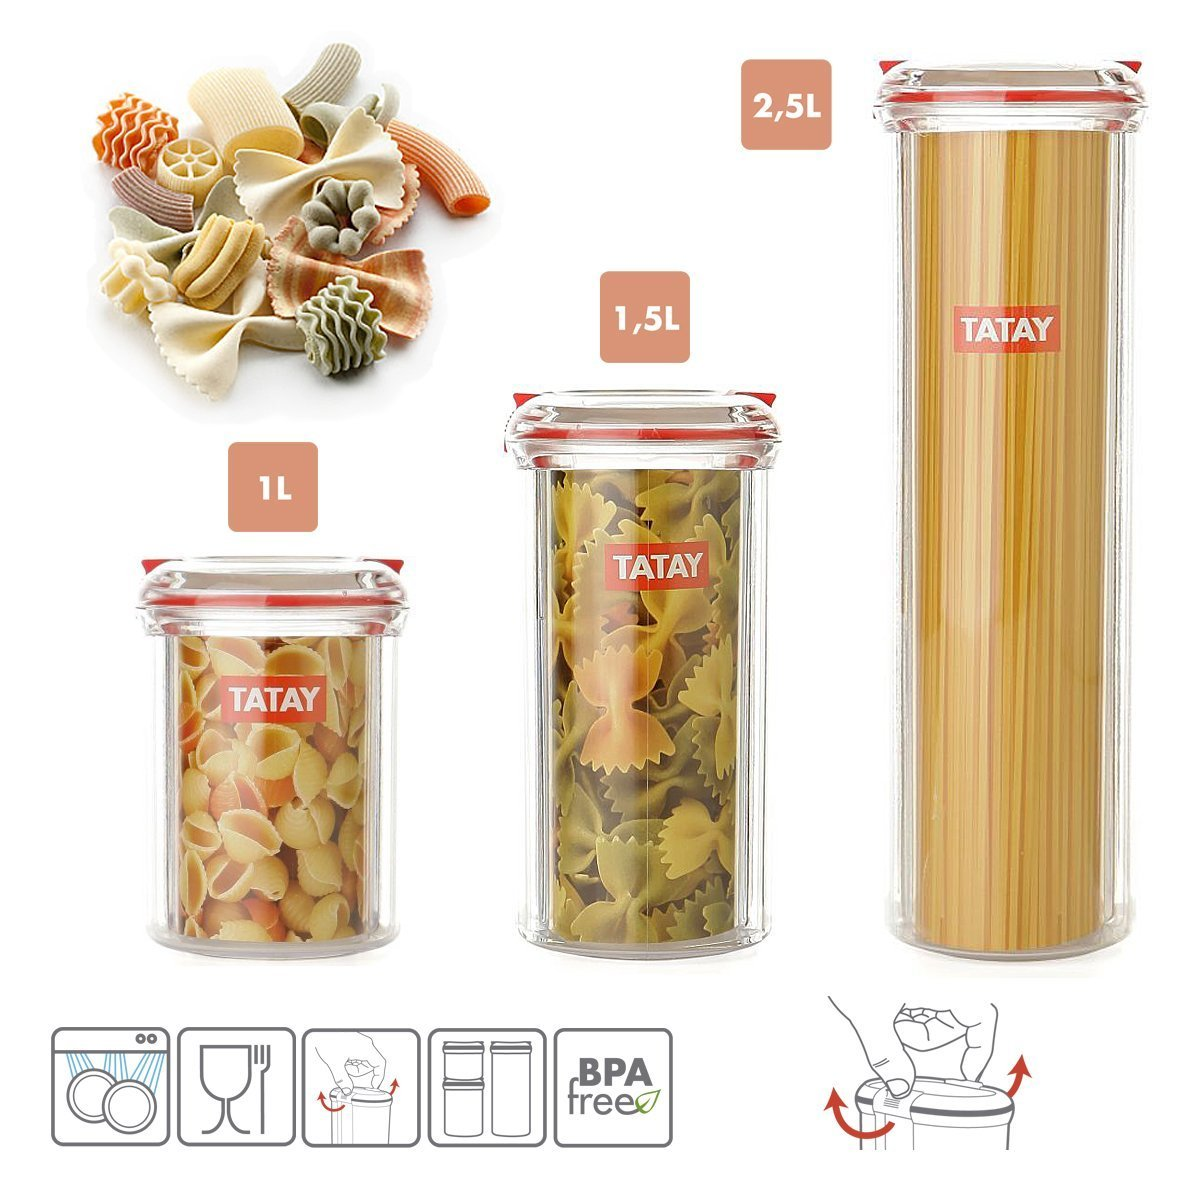 Tatay - Set di 3barattoli da cucina ermetici, in plastica di alta qualità, con chiusura di sicurezza, in 3 formati da 1, 1,5 e 2,5 l